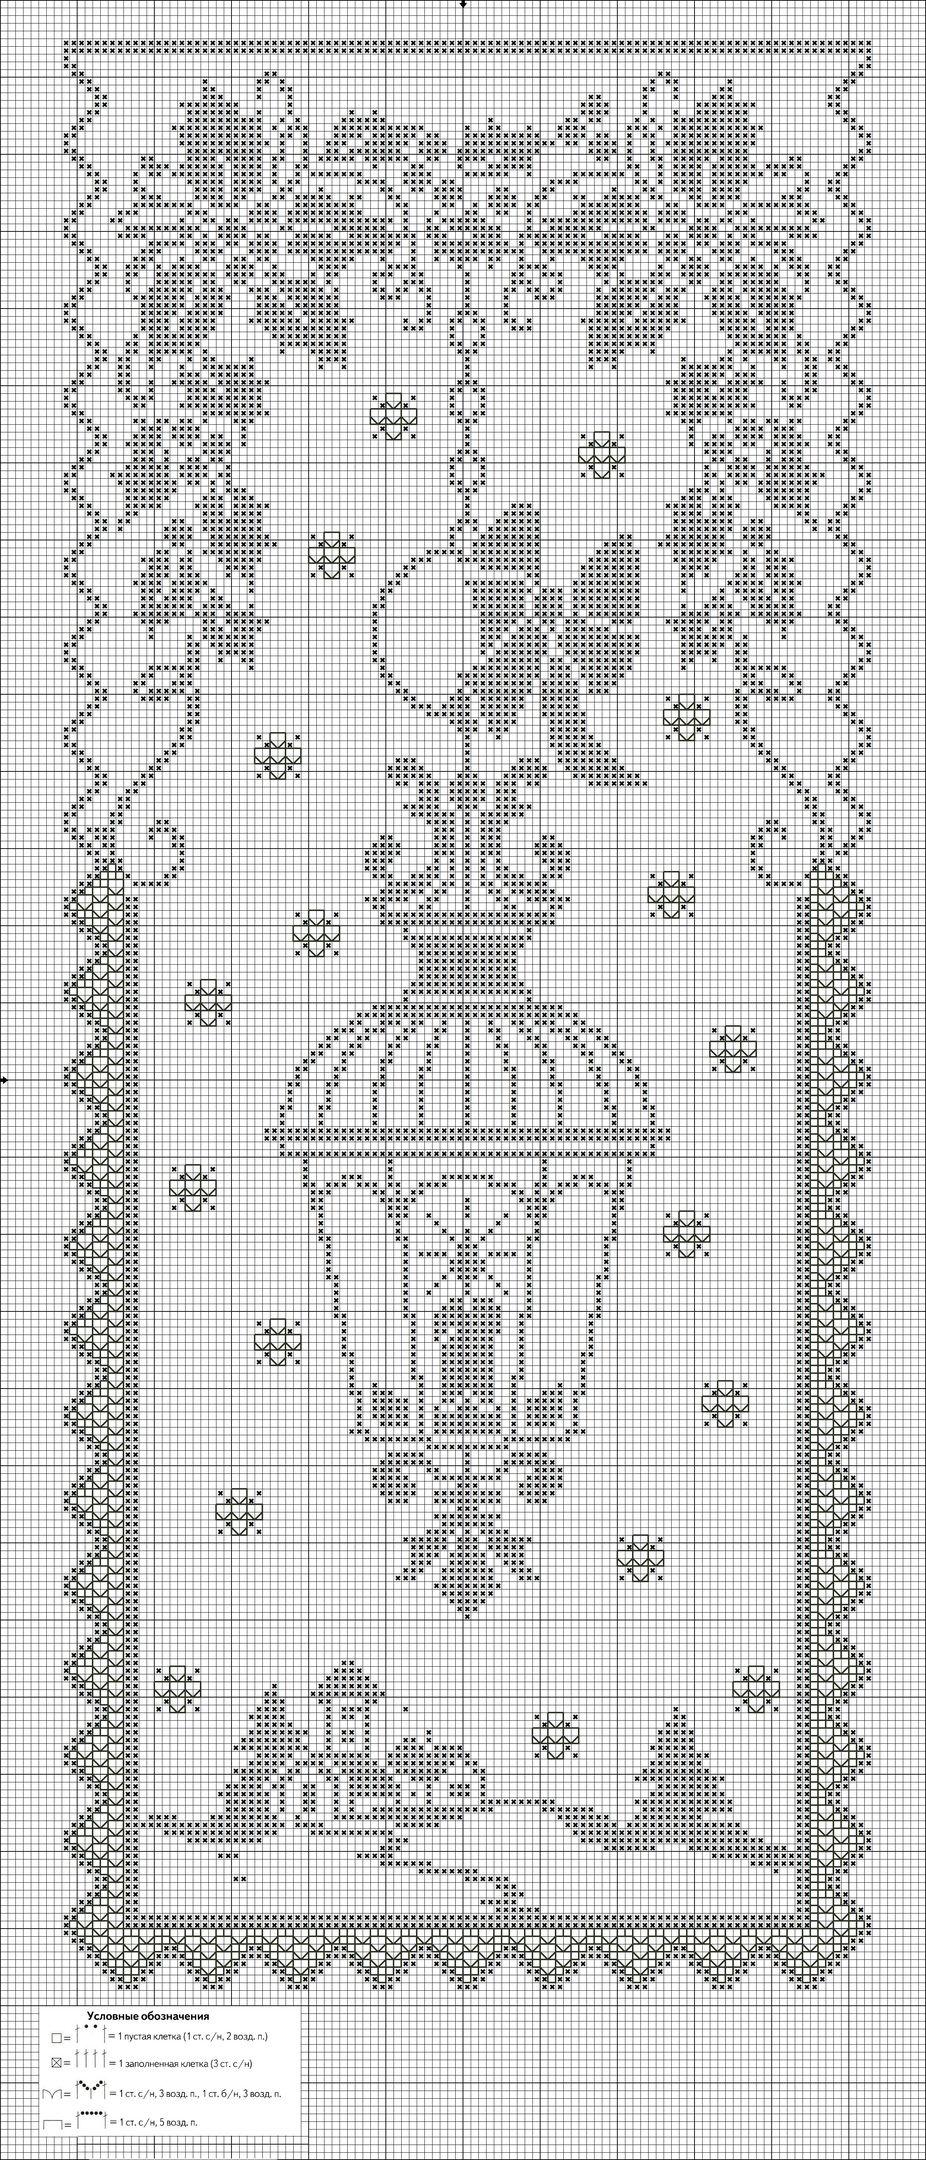 500 Crochet Christmas Ideas Christmas Crochet Crochet Patterns Crochet